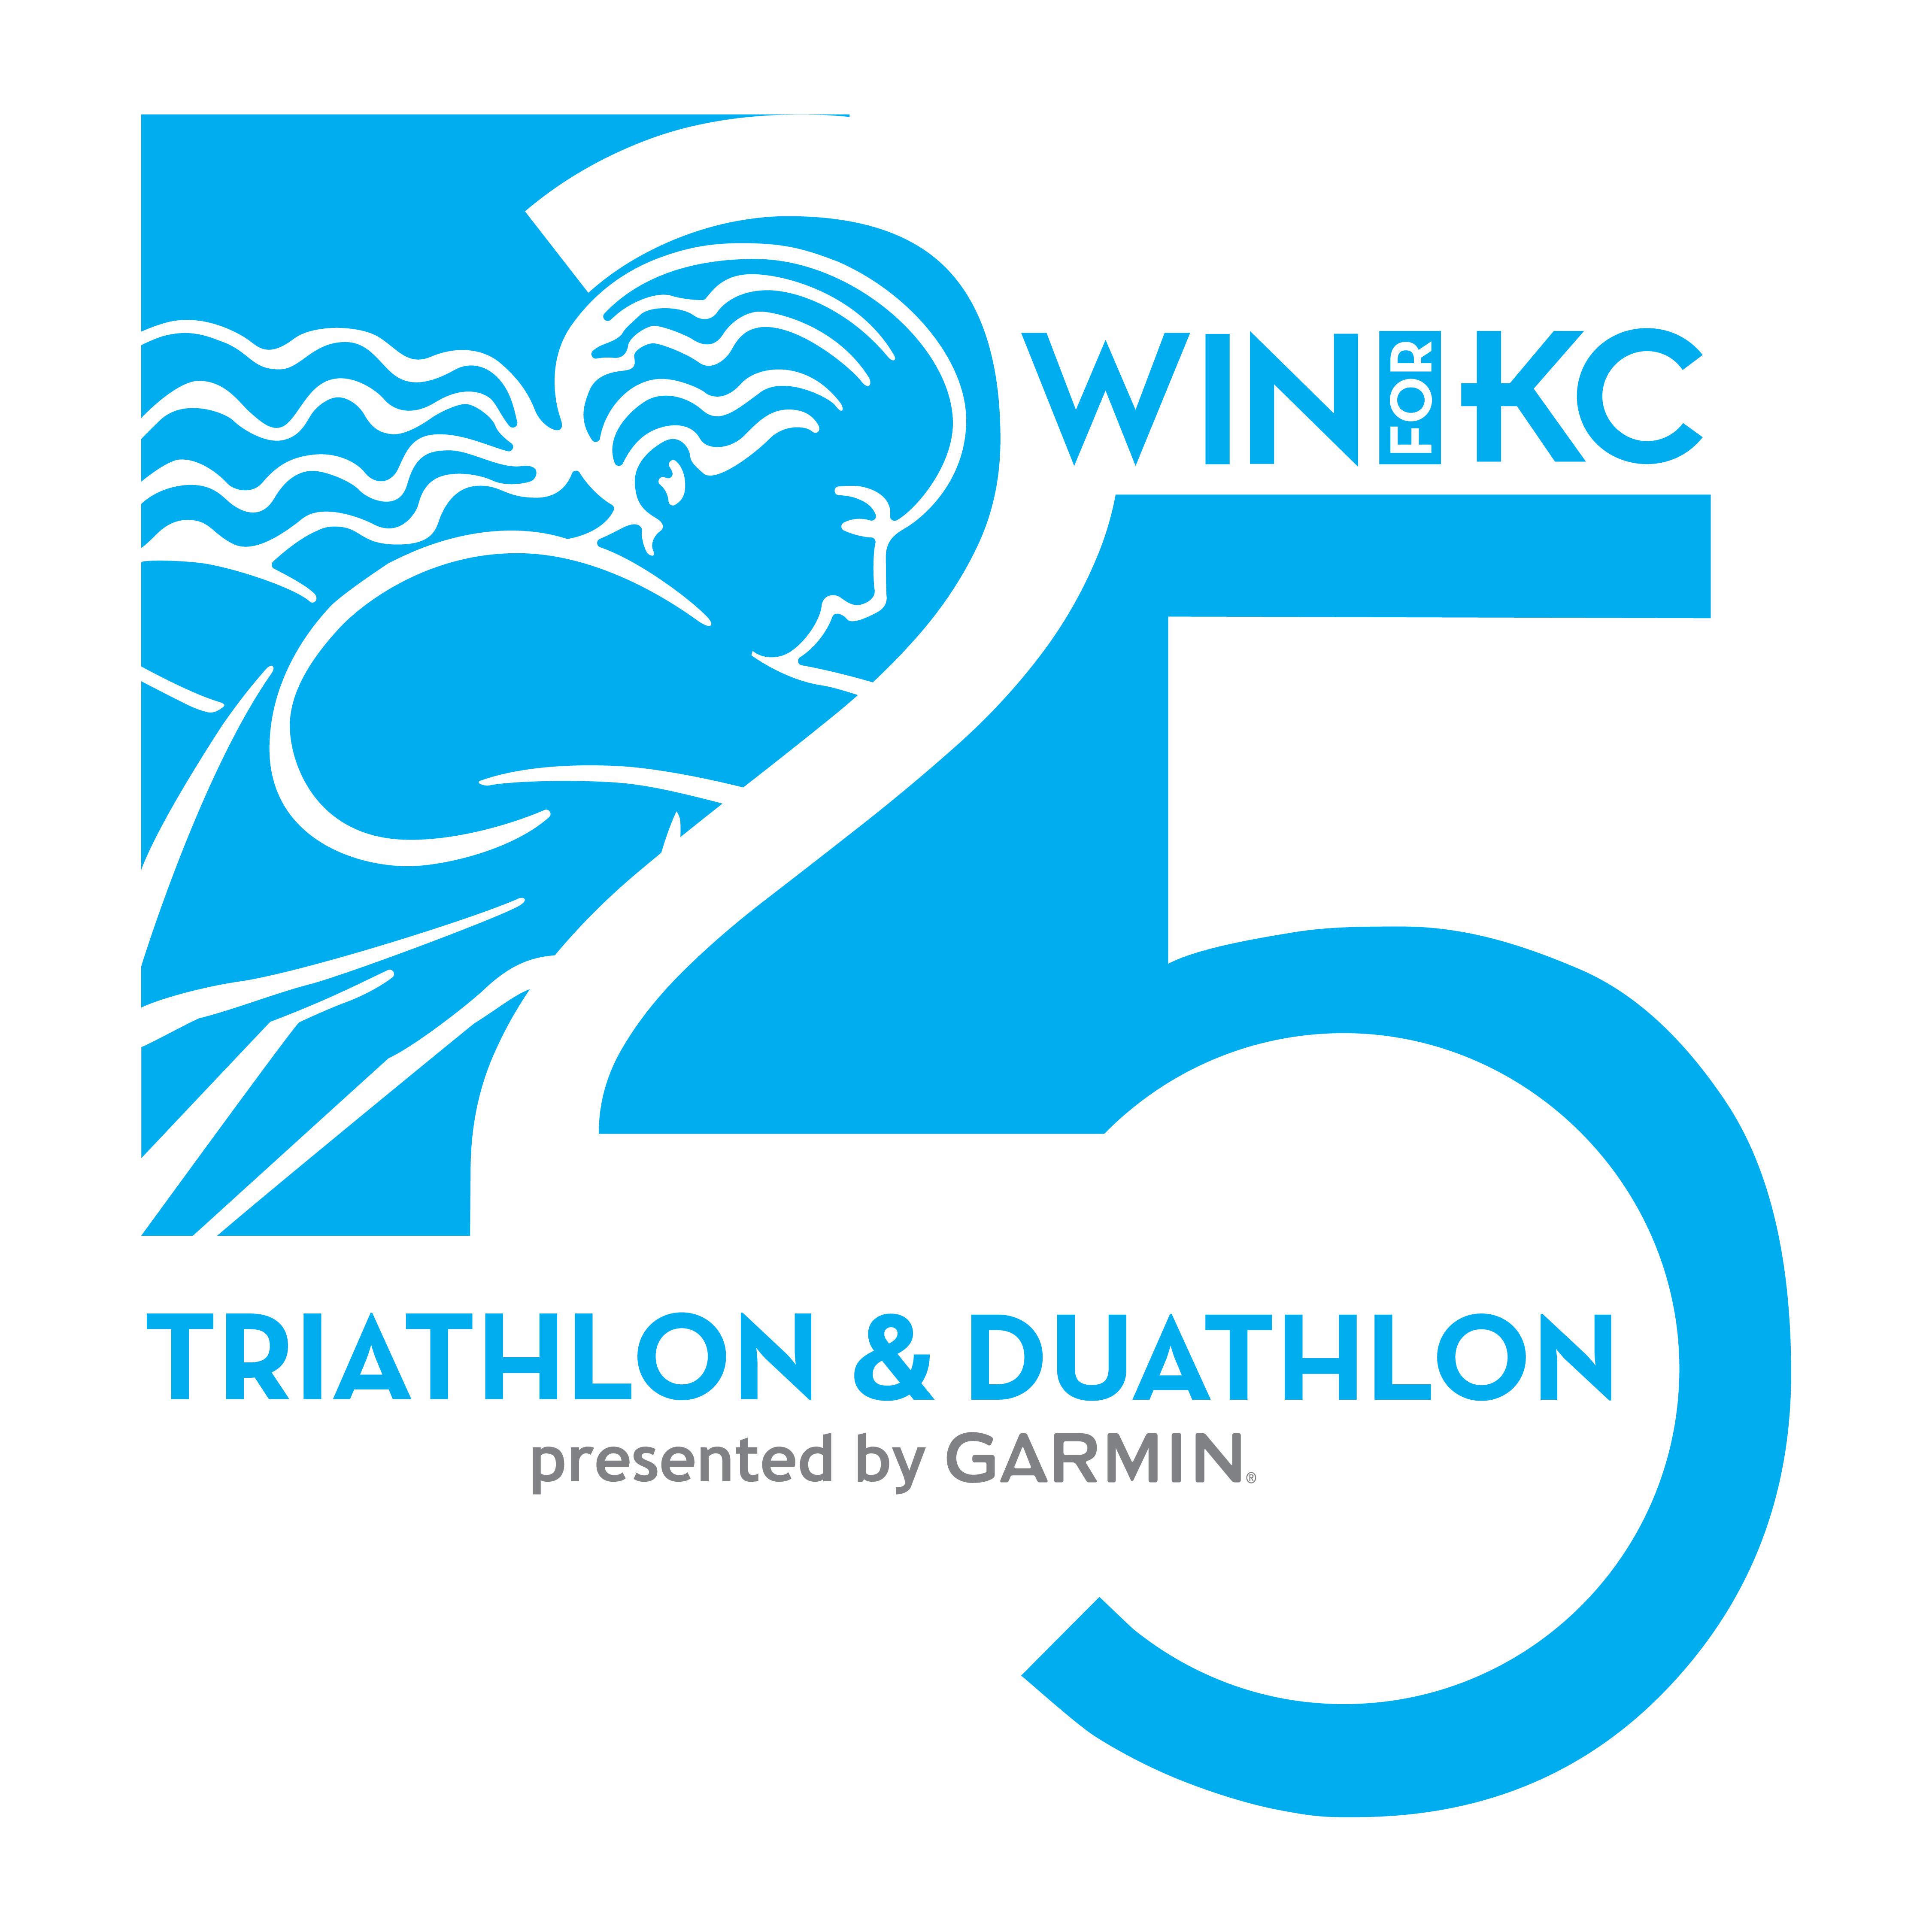 2019 — 2019 WIN for KC Women's Triathlon & Duathlon